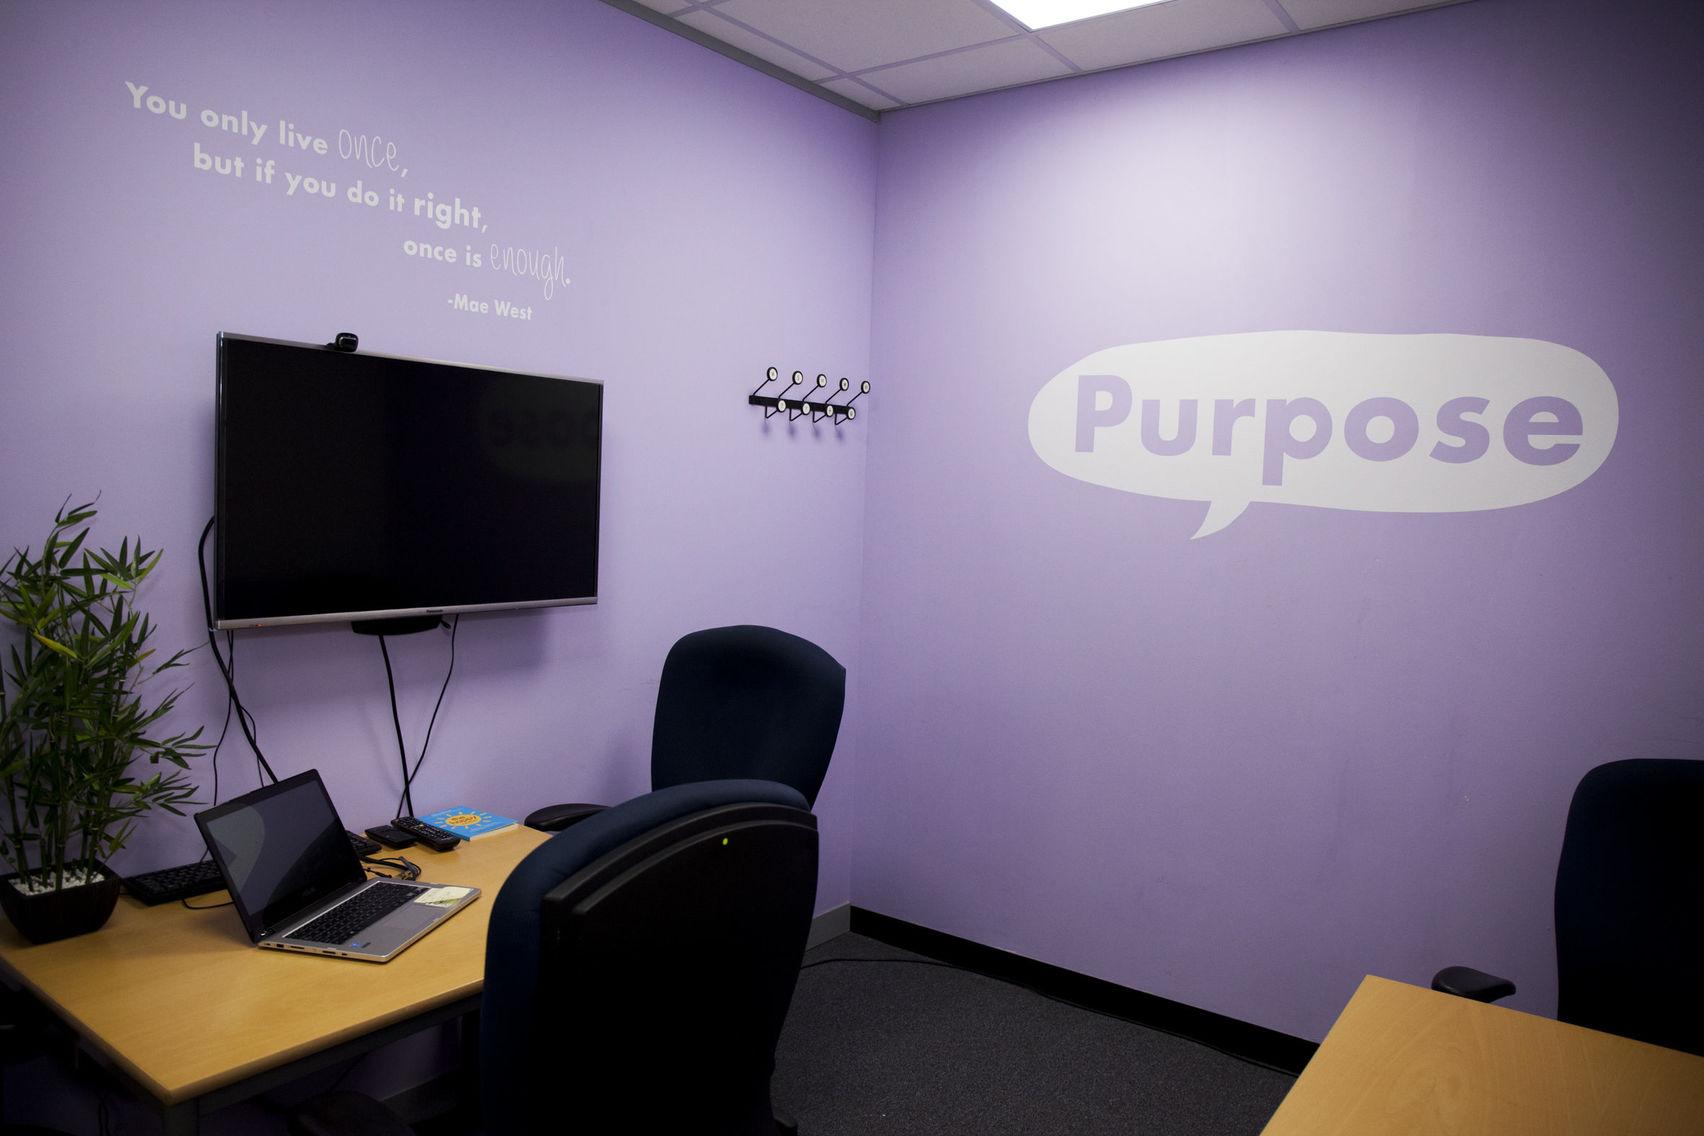 Room 7, Purpose, Happy Computers Ltd